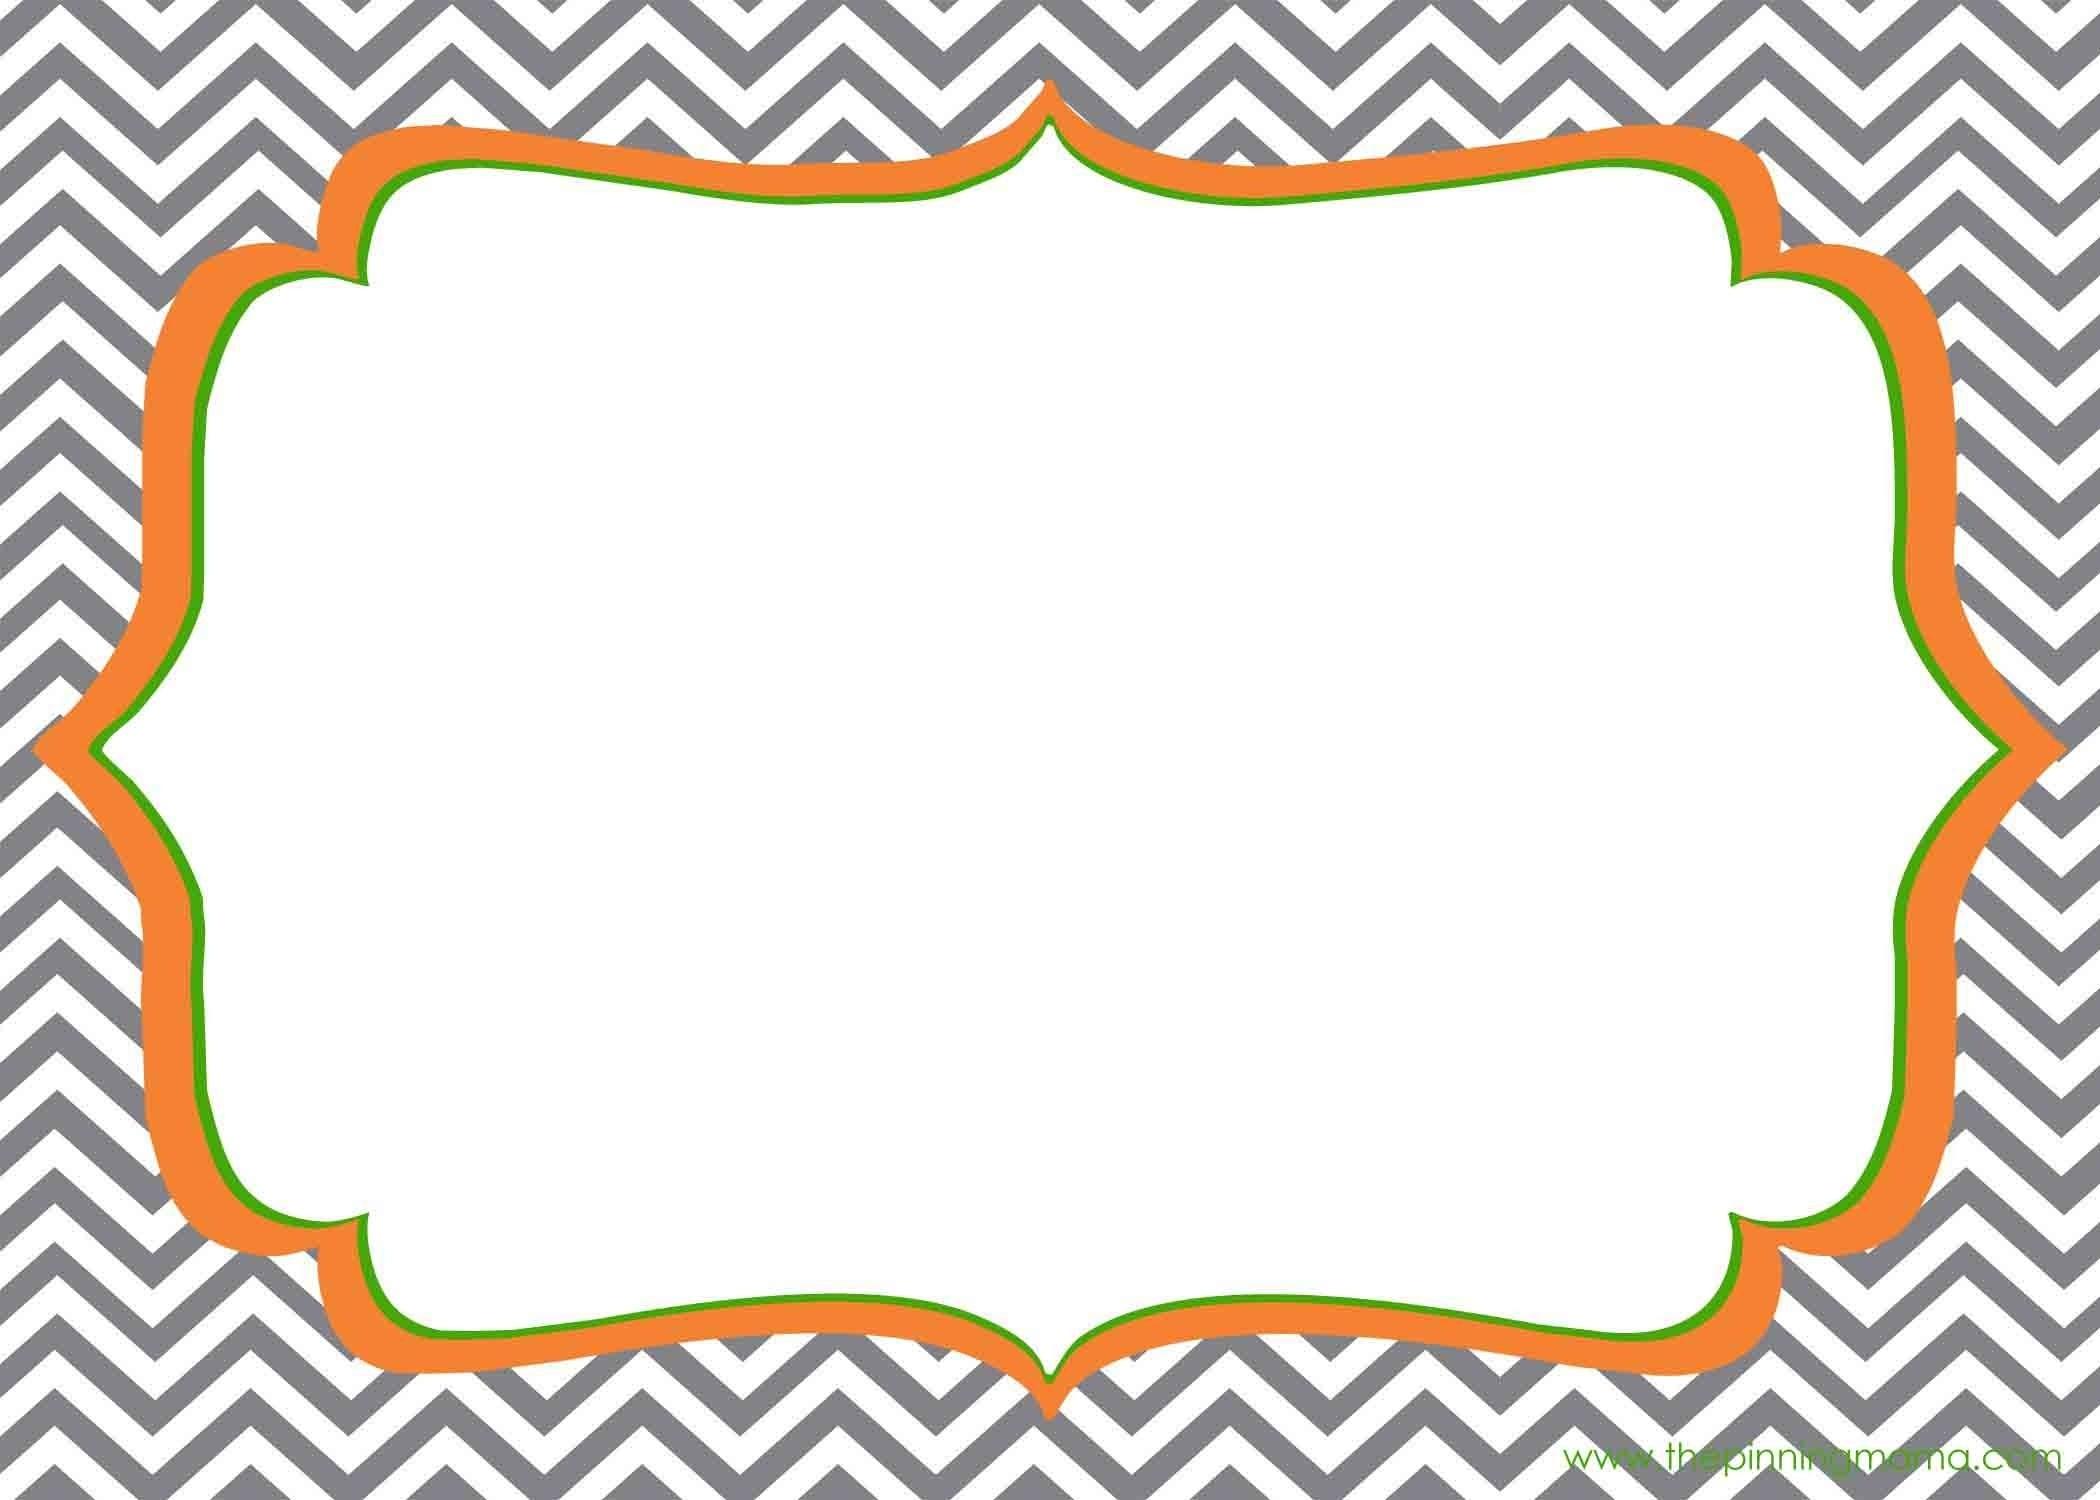 Free Printable Baby Cards Templates - Printable Cards - Free Printable Baby Cards Templates